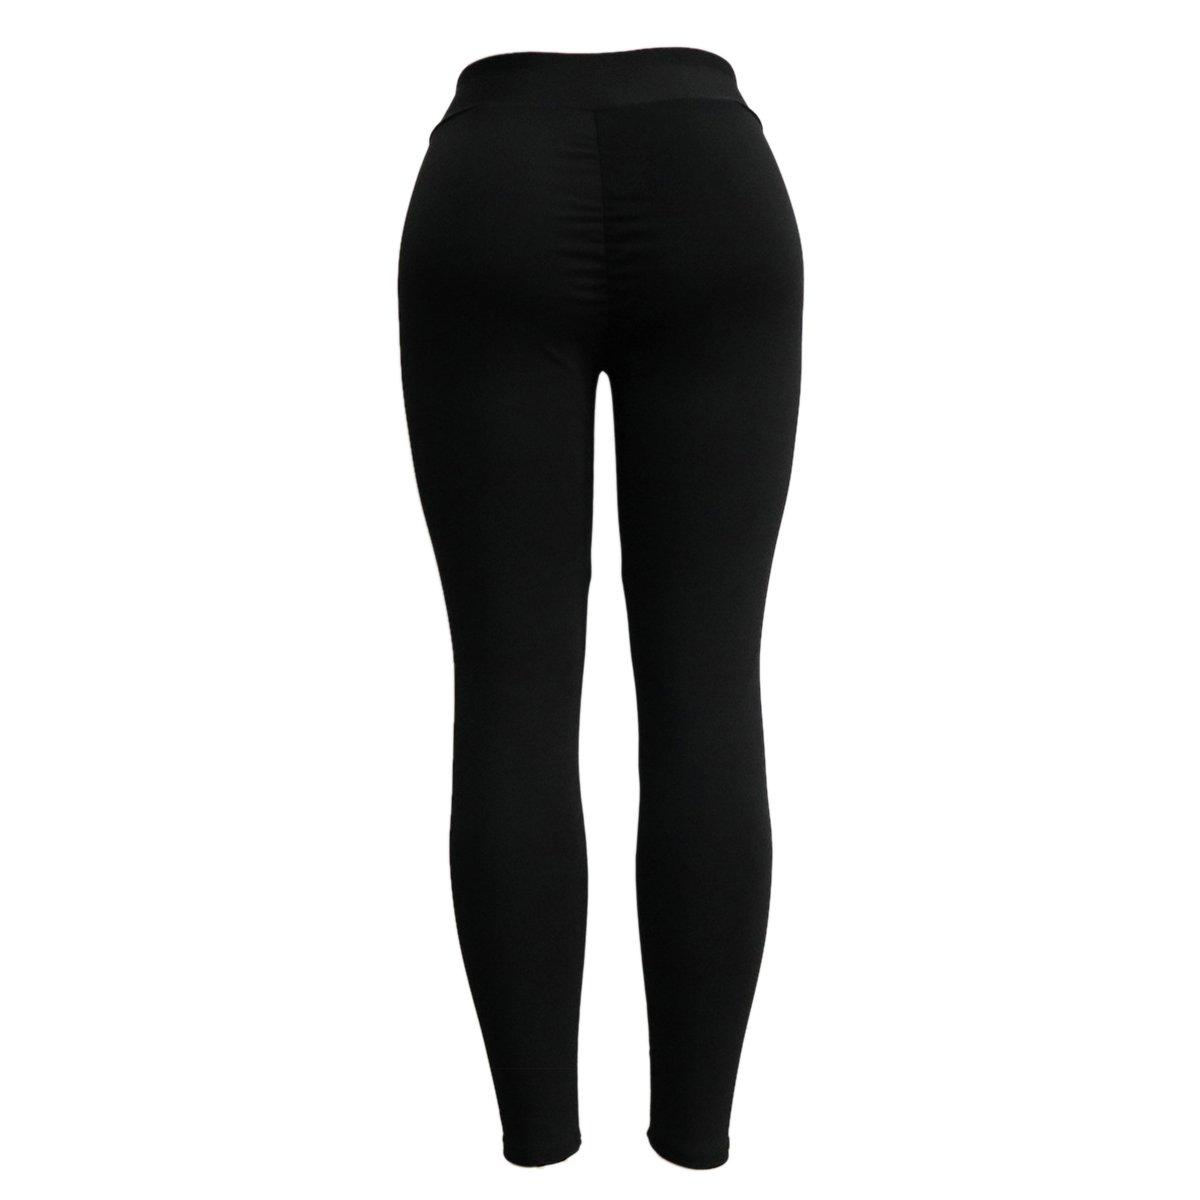 2c15685ecaaac Amazon.com : TOOGOO Fashion Push Up Leggings Women Workout Leggings Slim Leggings  Polyester V-Waist Jeggings Women Pencil Pants Jogging Pants Black S ...